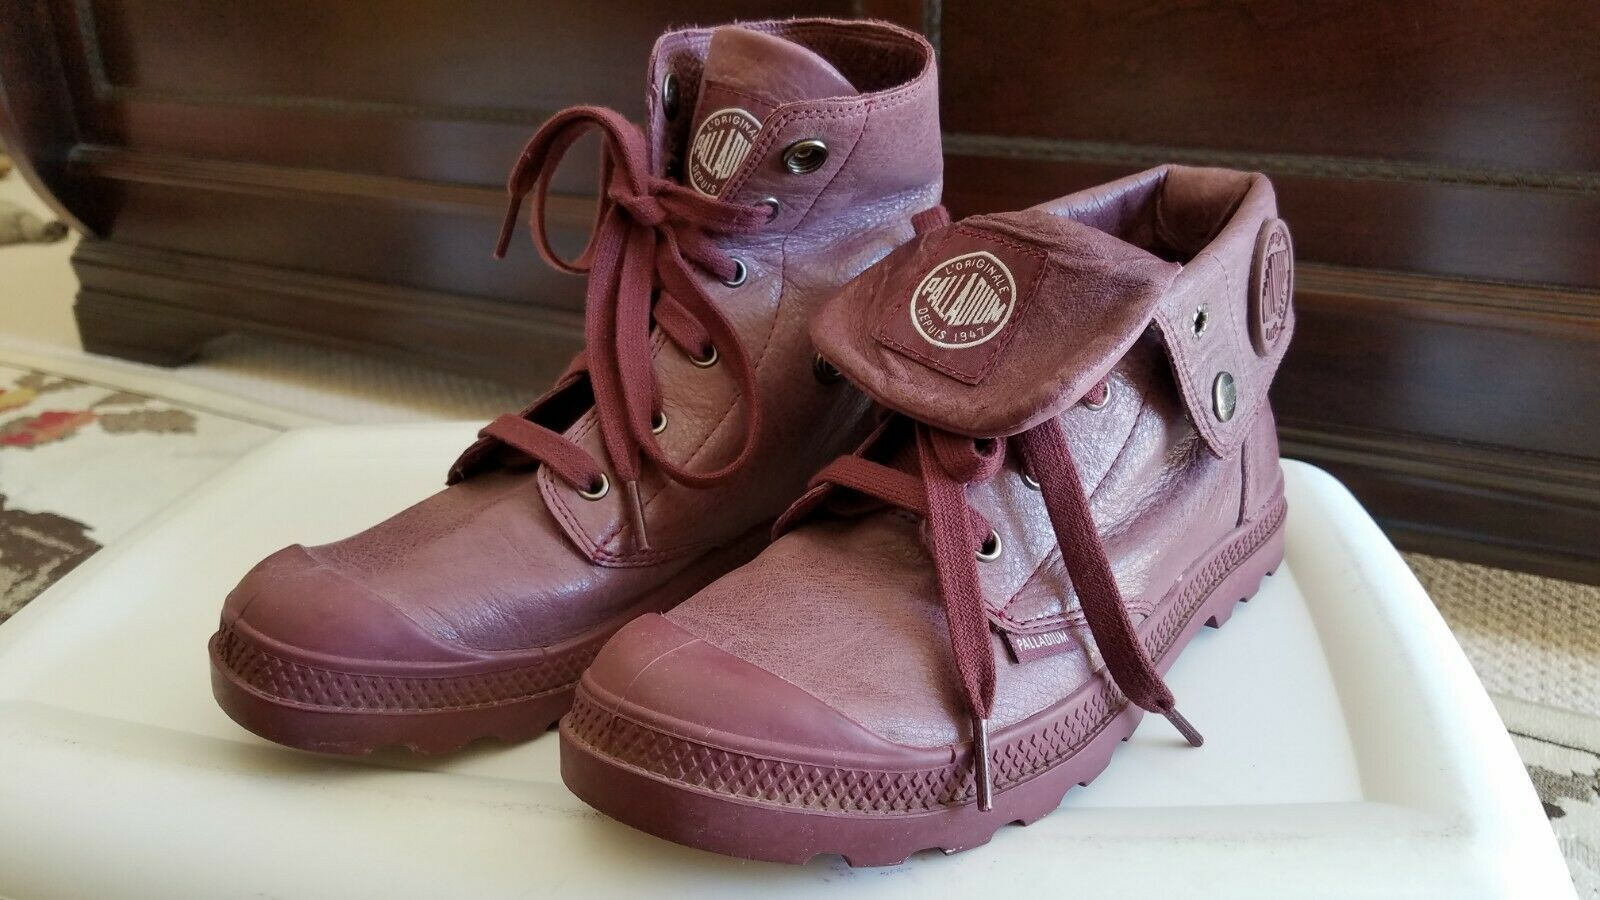 Palladium womens 8.5 8.5 8.5 leather maroon boot 6c88fe